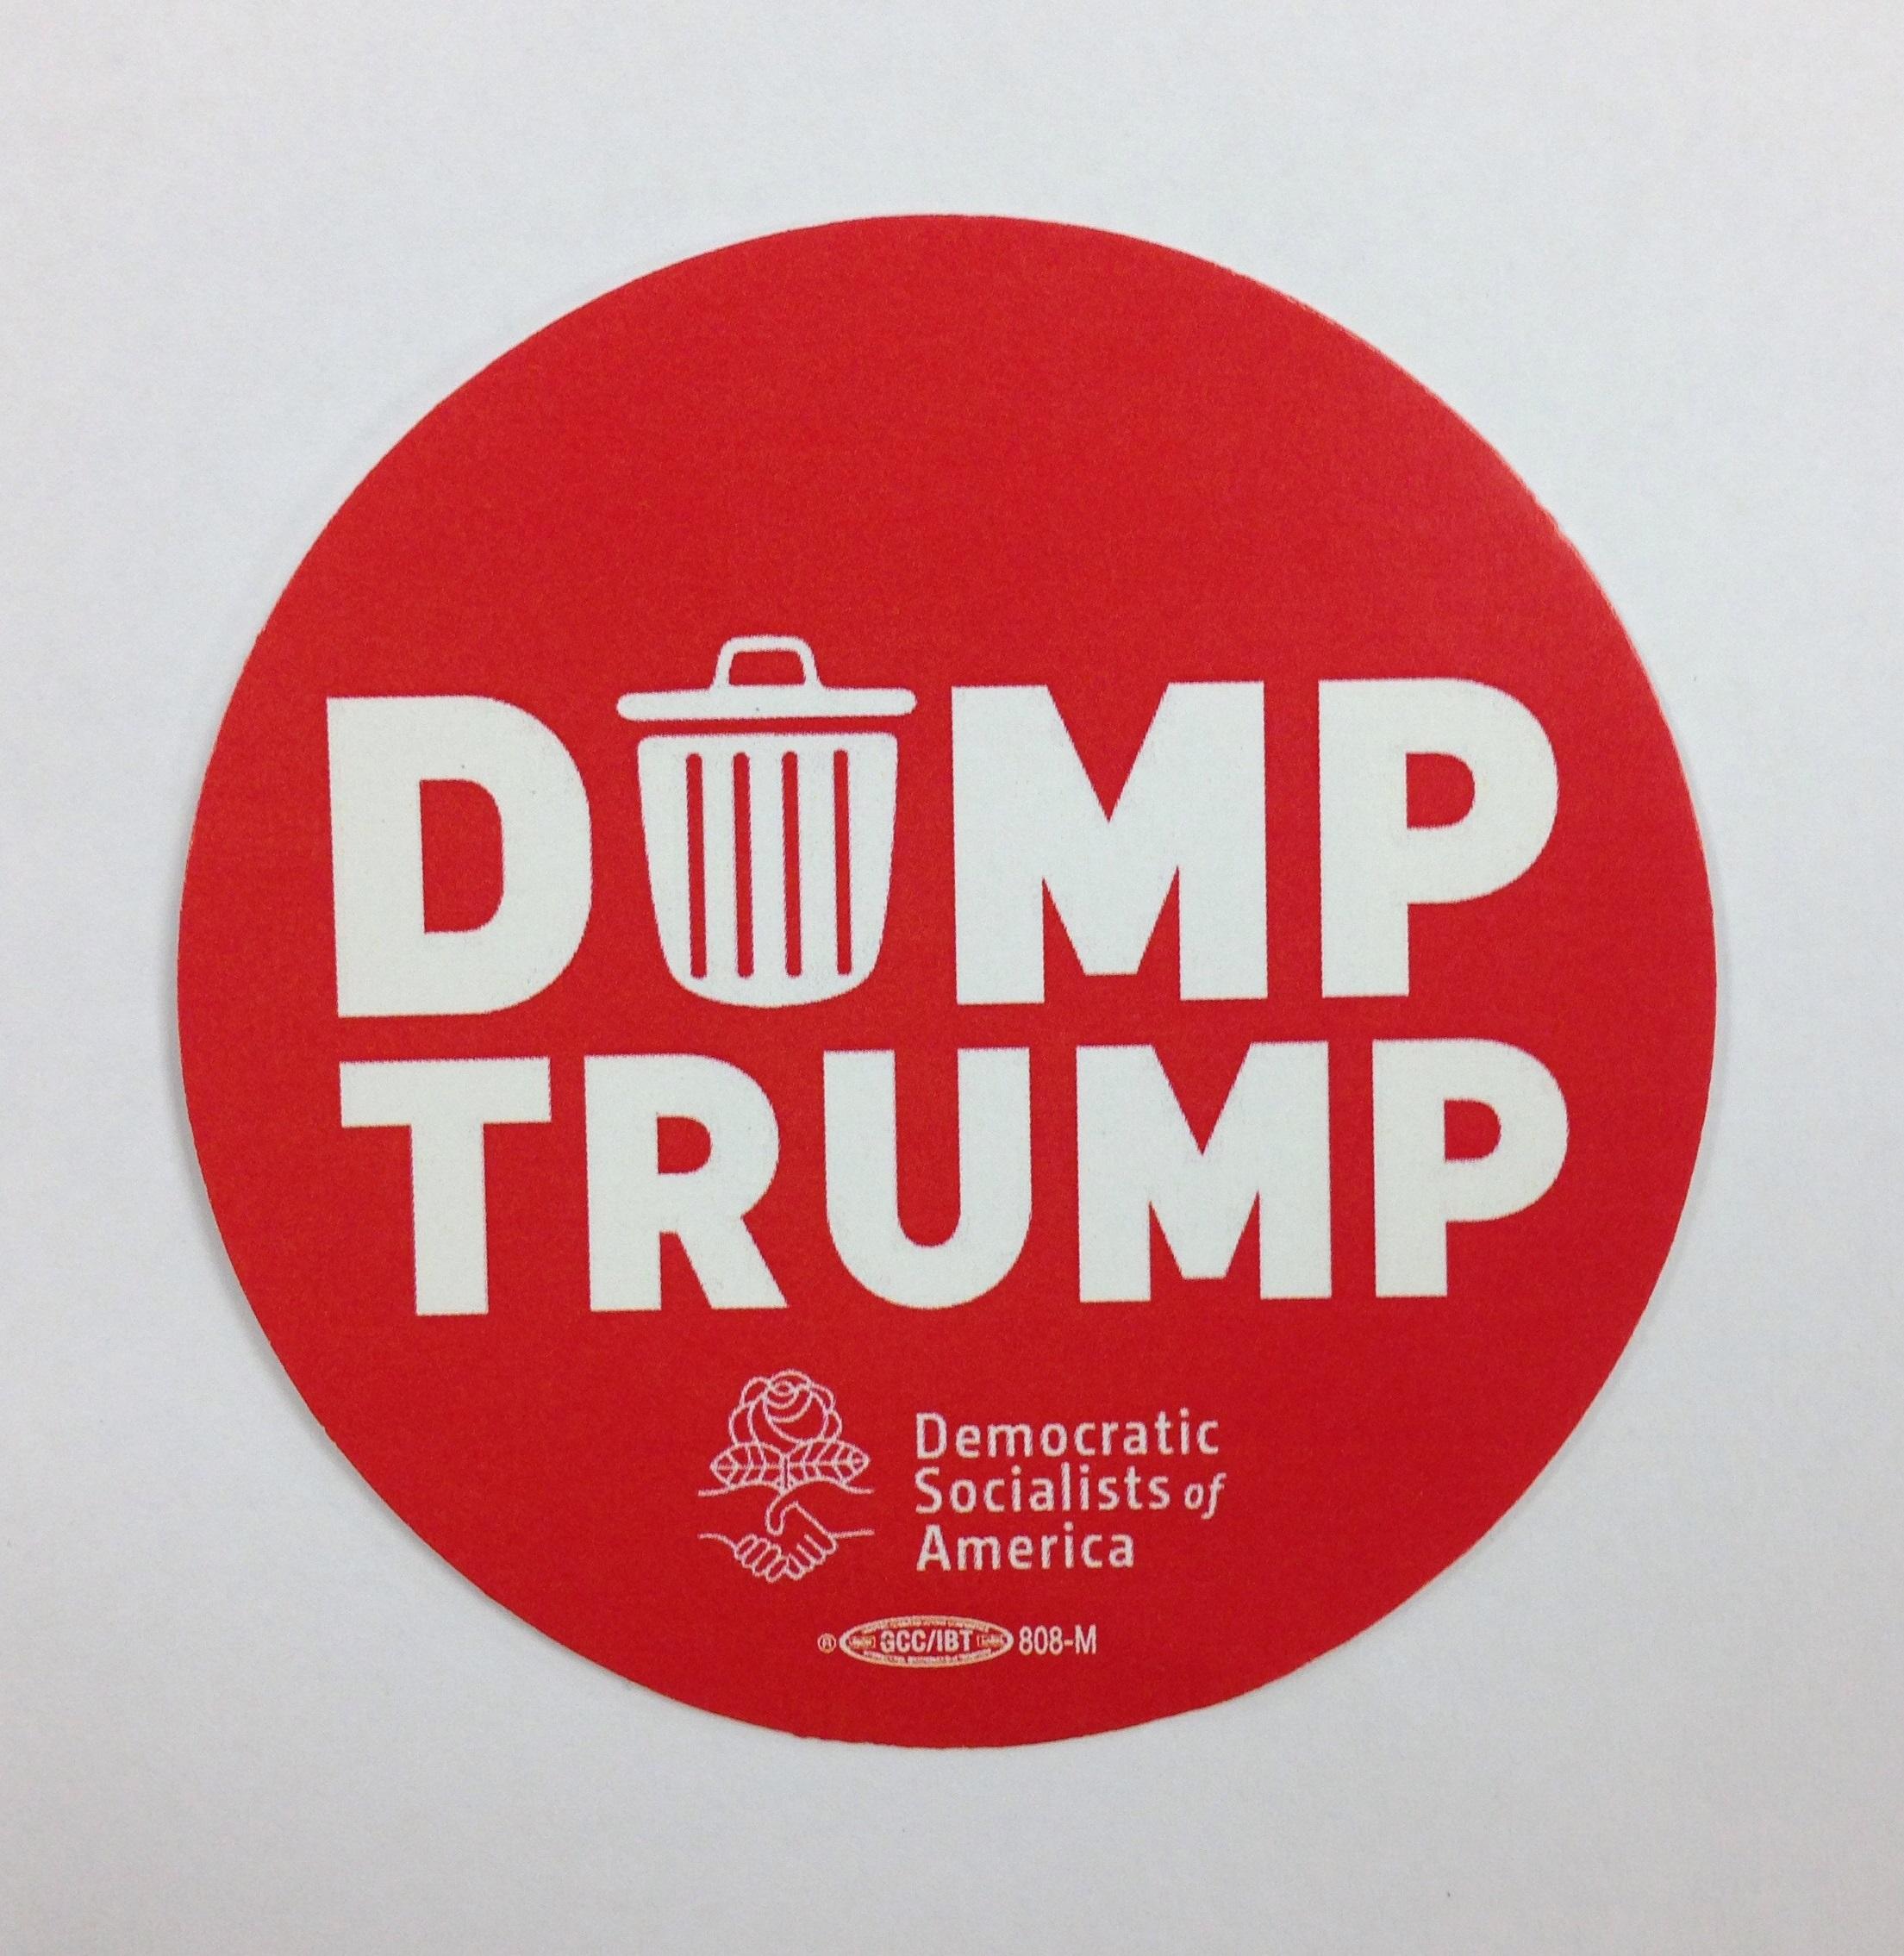 TrumpStickerImgB.jpg